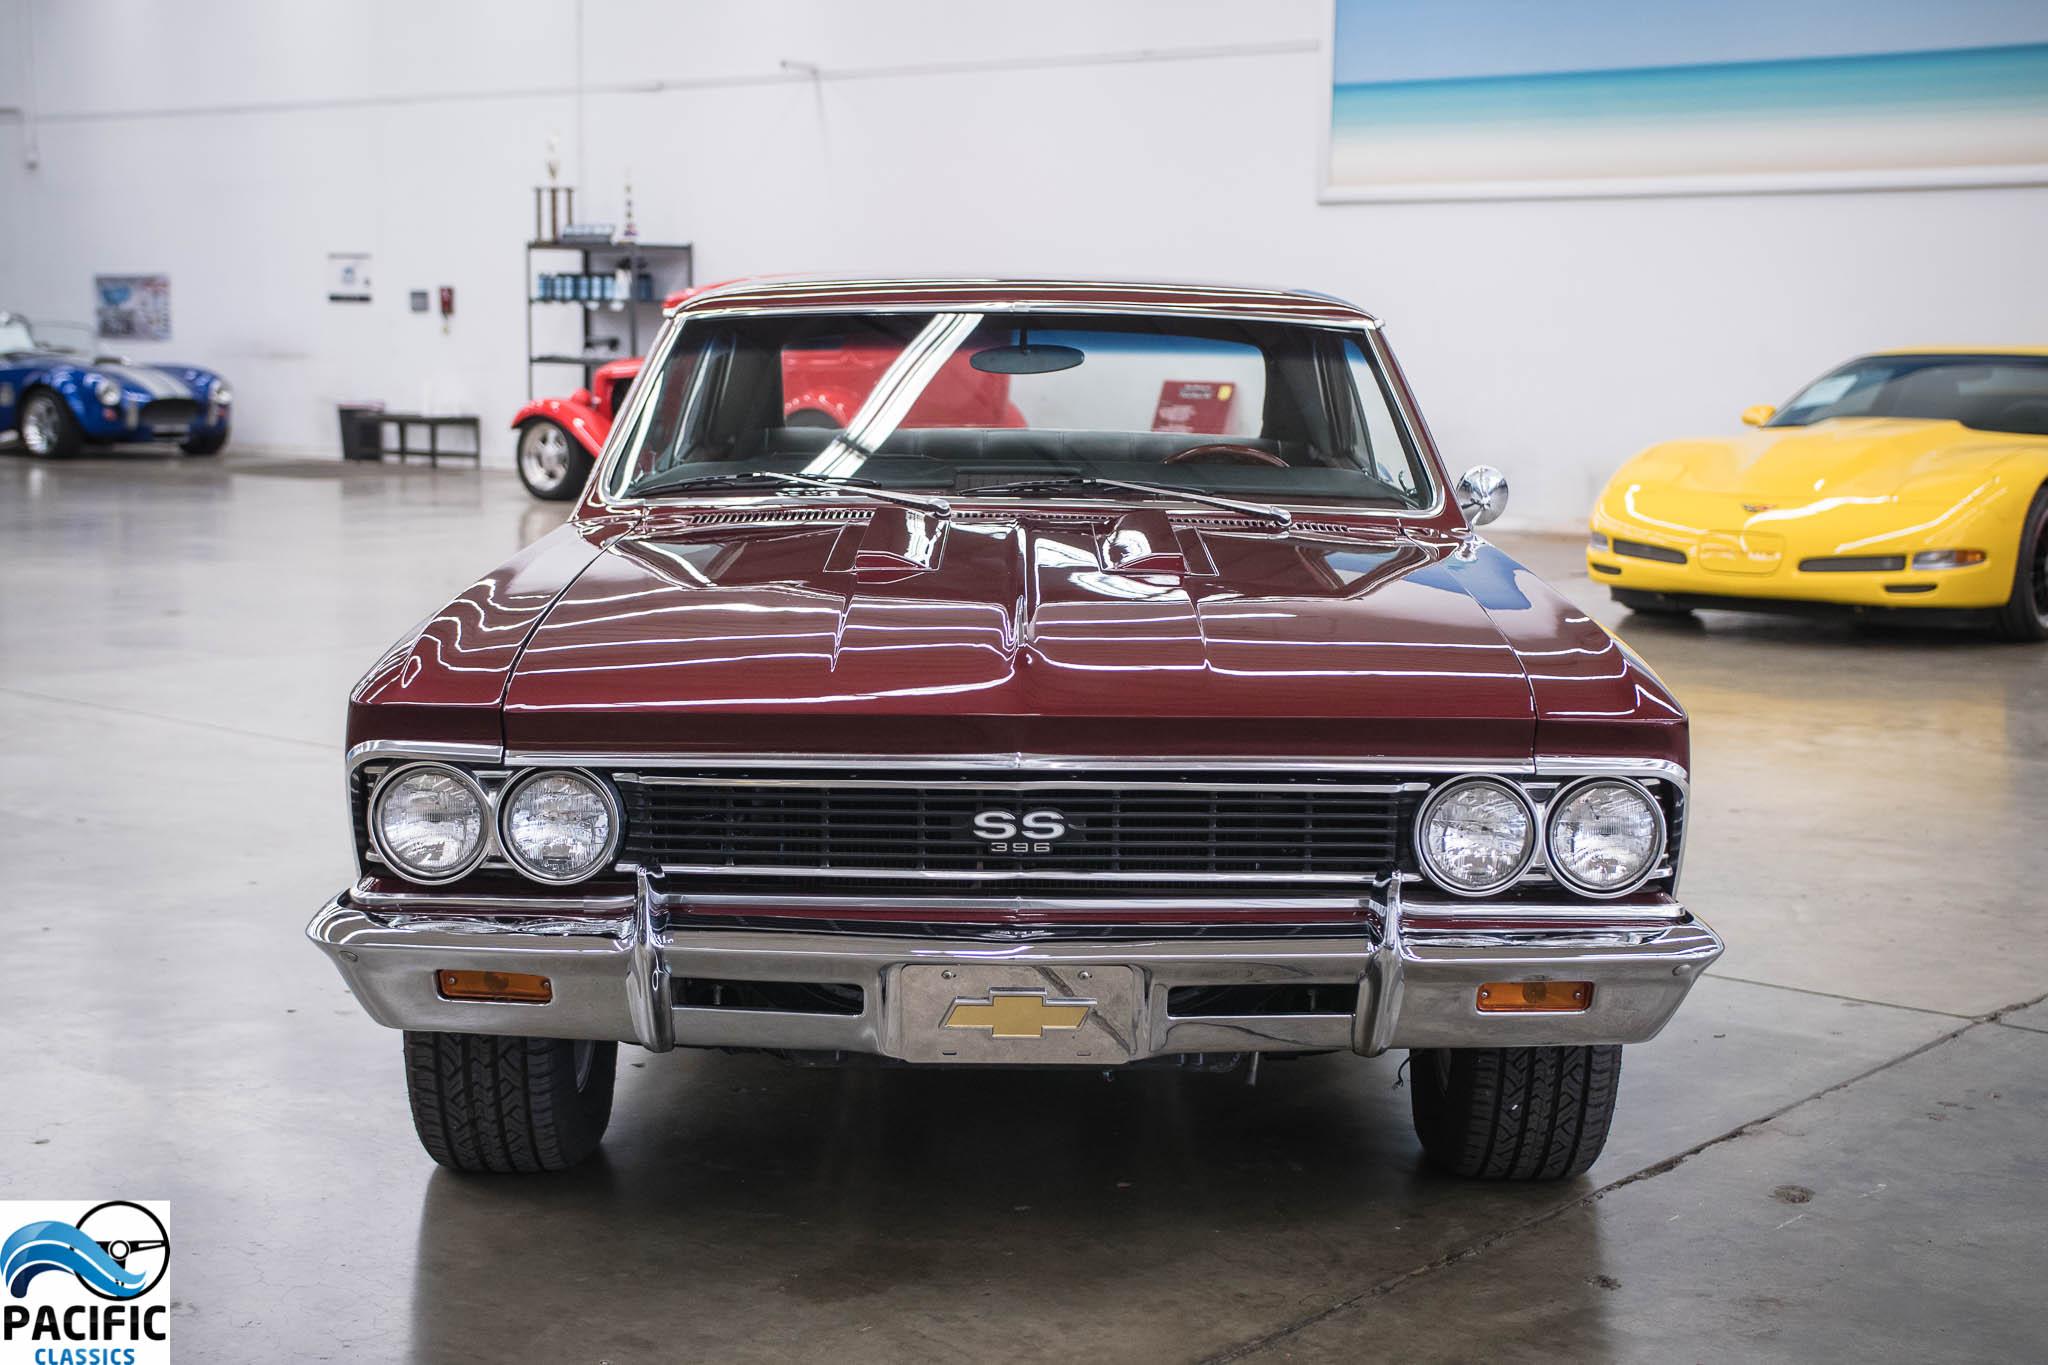 1966 Chevrolet Chevelle SS 396